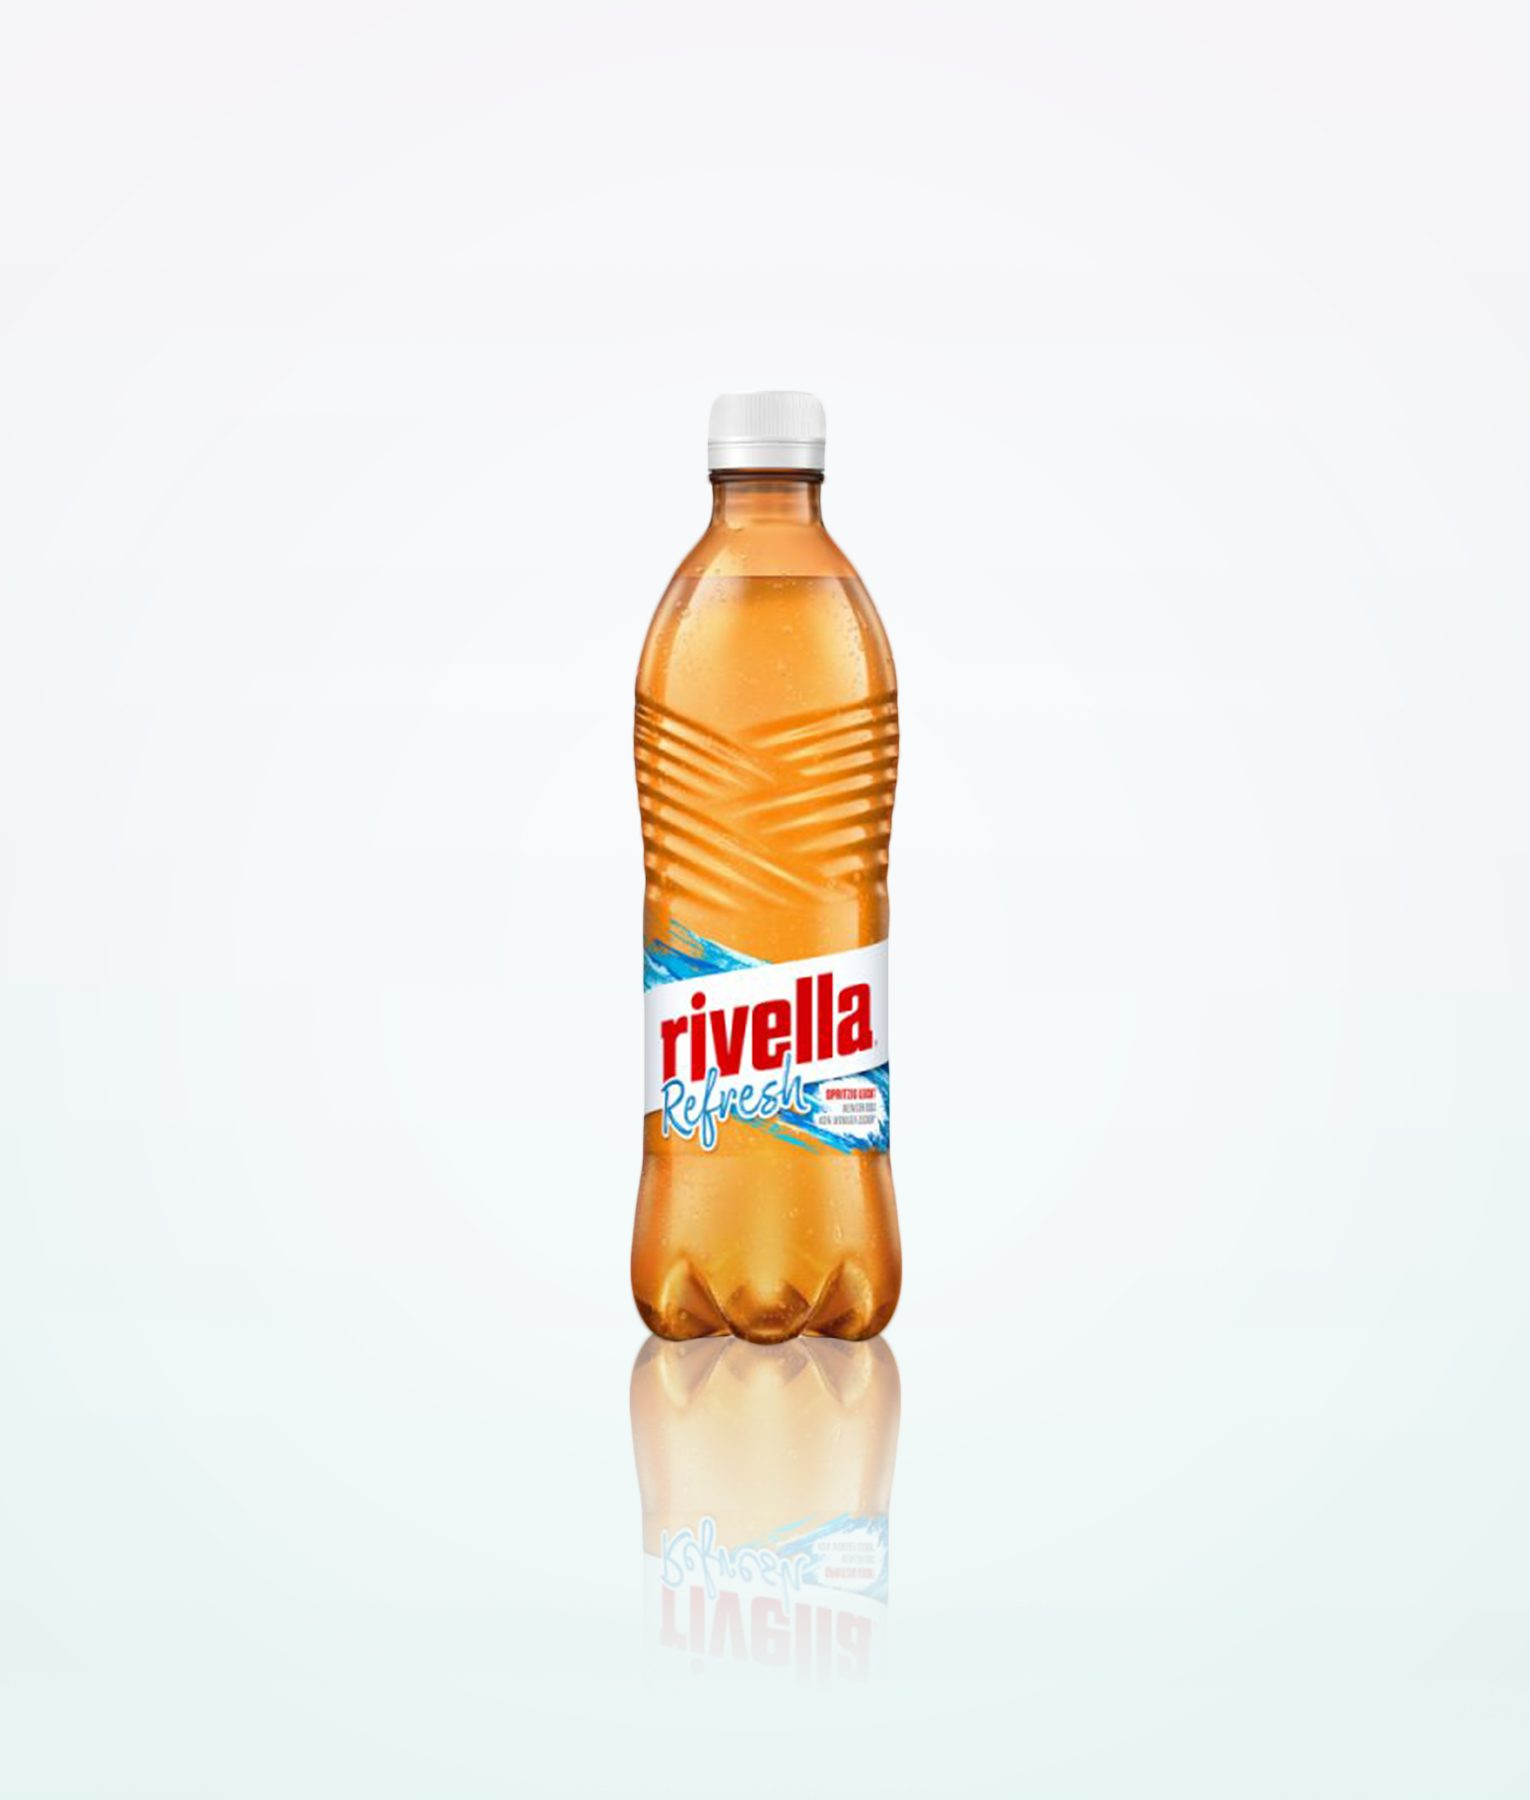 rivella-refresh-500ml